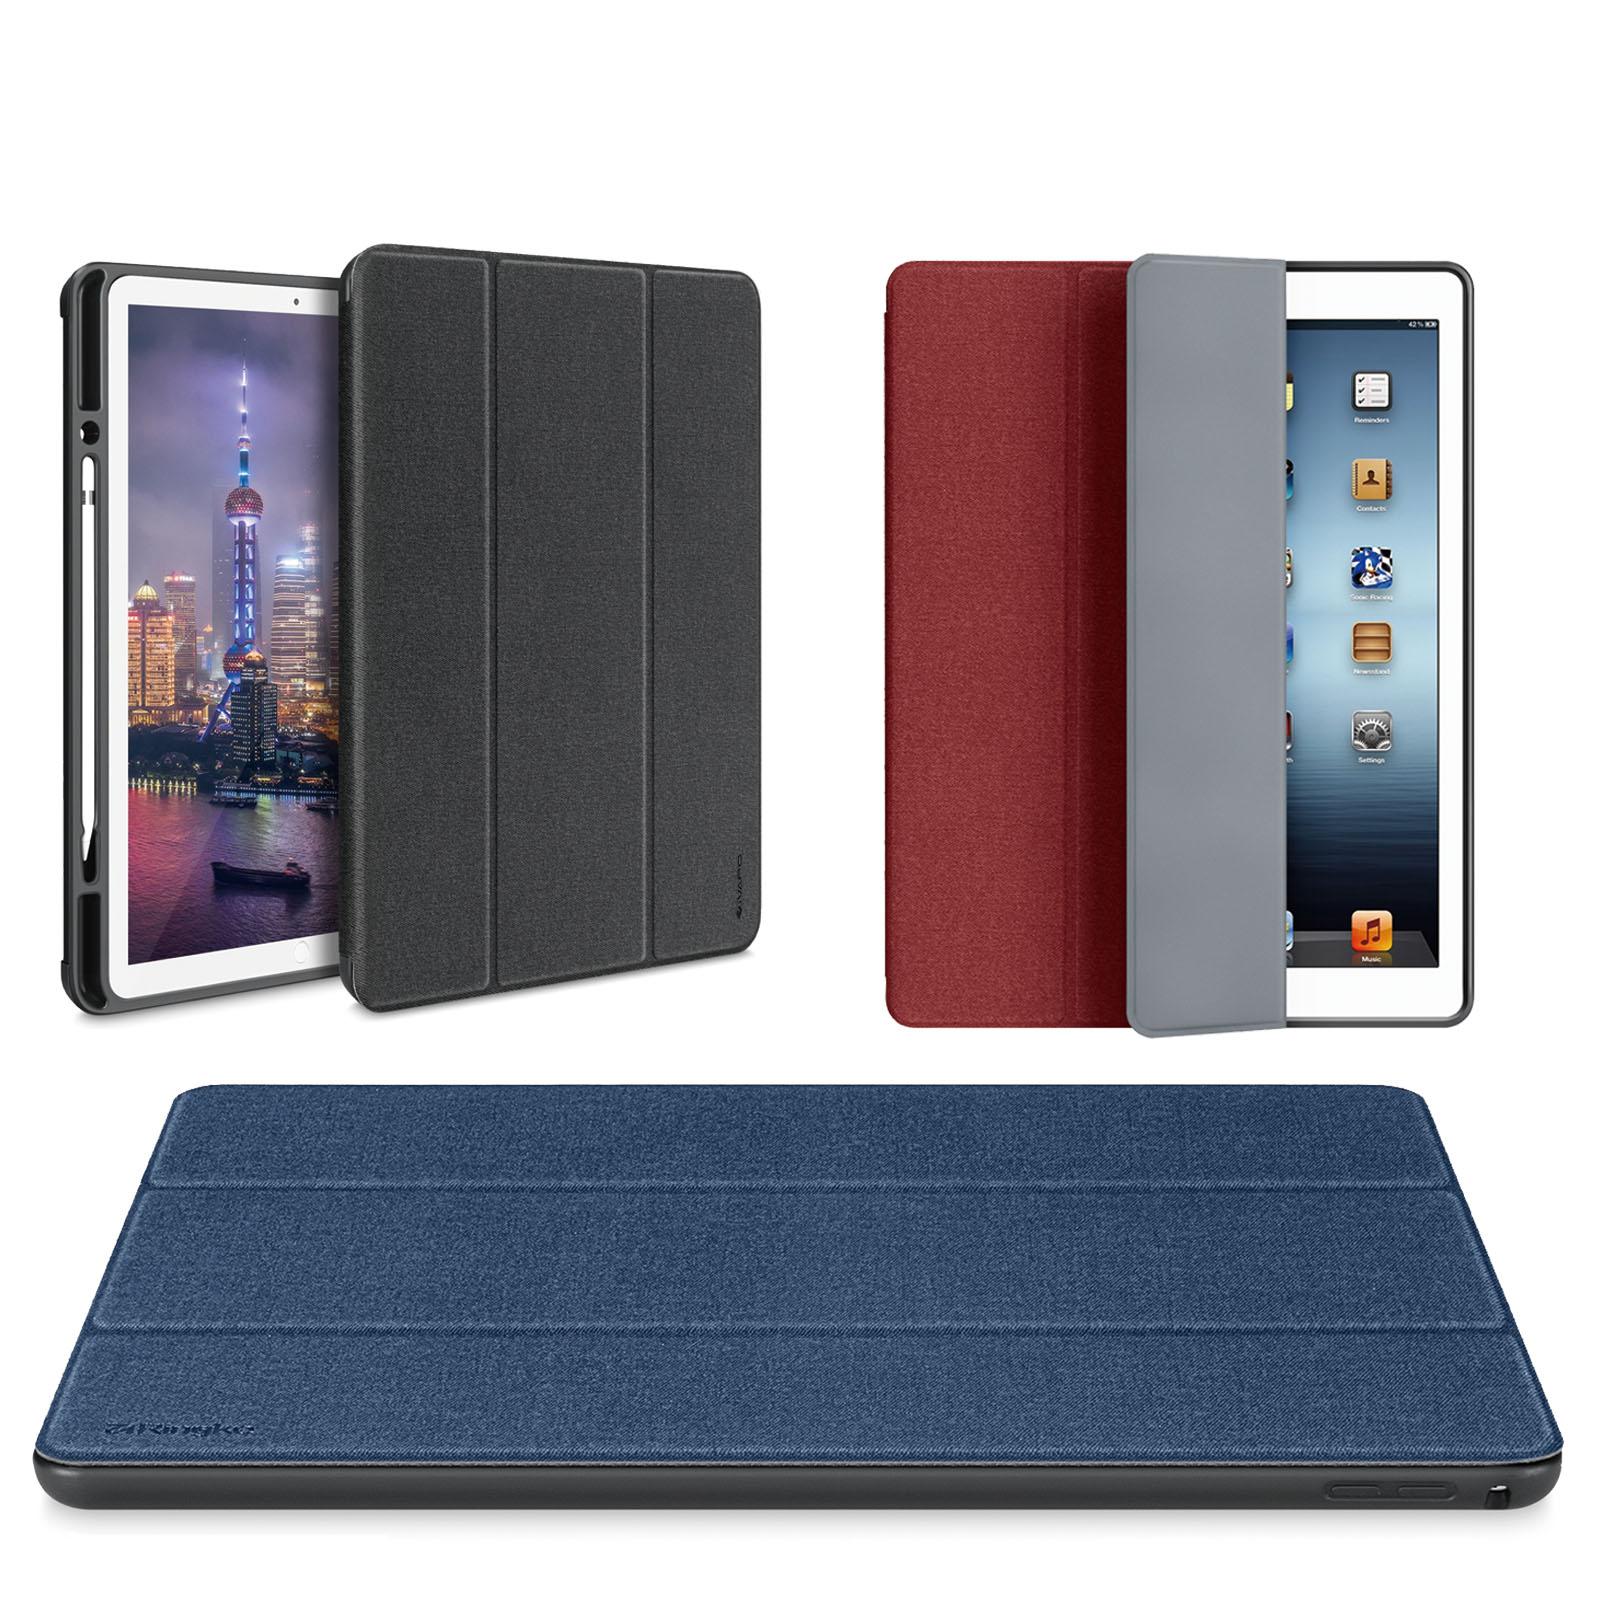 Pu Leather Folding Case Cover For New Ipad Pro 9 7 Inch 2017 Intl Mini 4 Luxury Kakusiga Carbon Fiber Smart Flip Atau With Pencil Holder Slim Apple 129